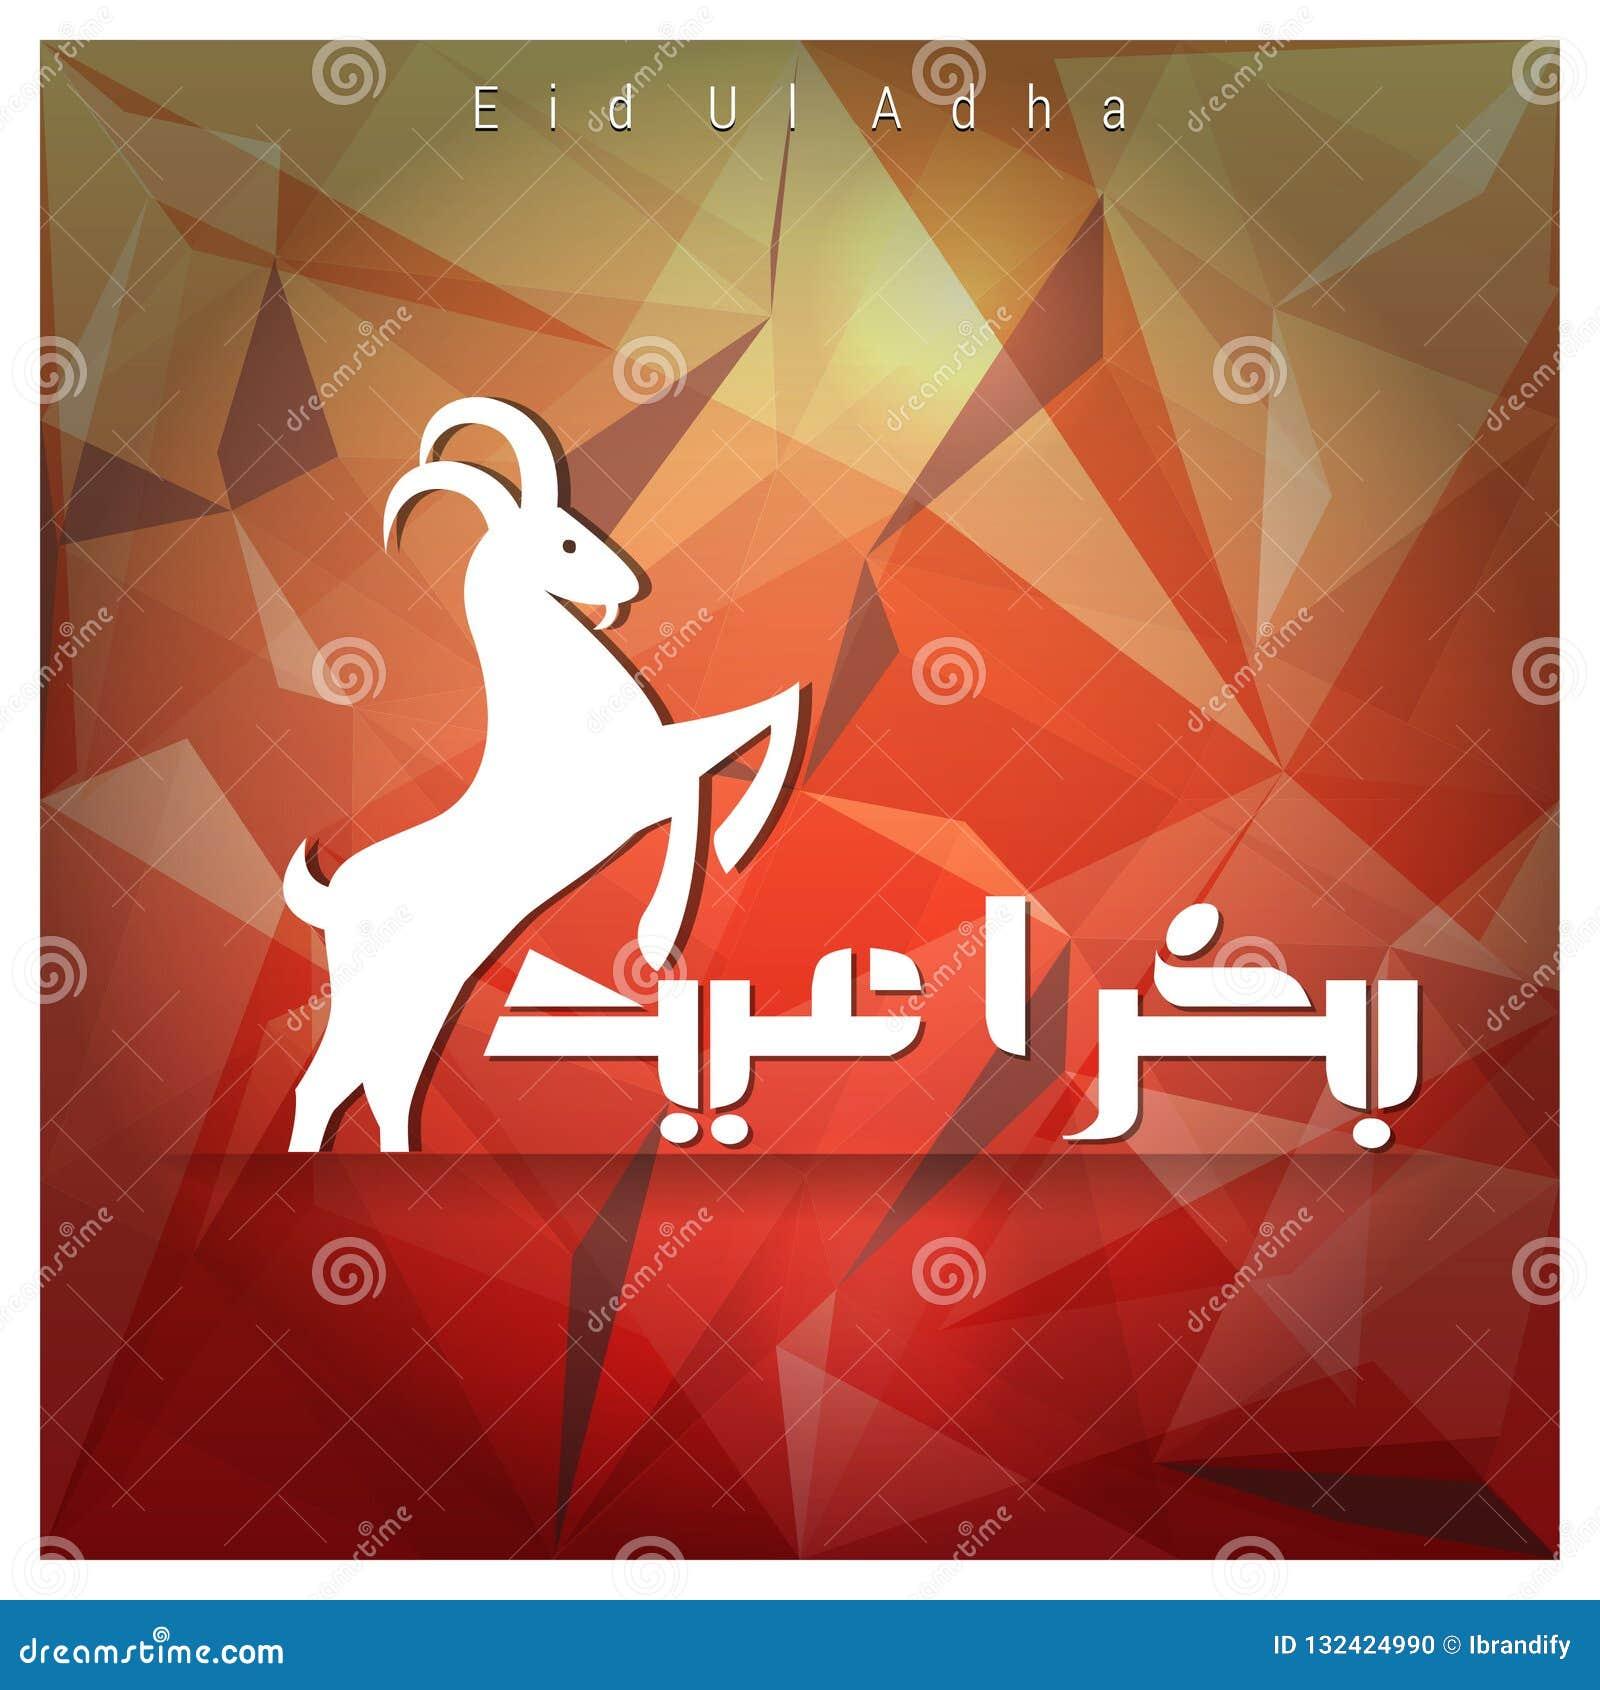 eid ul adha mubarak card with creative design vector stock